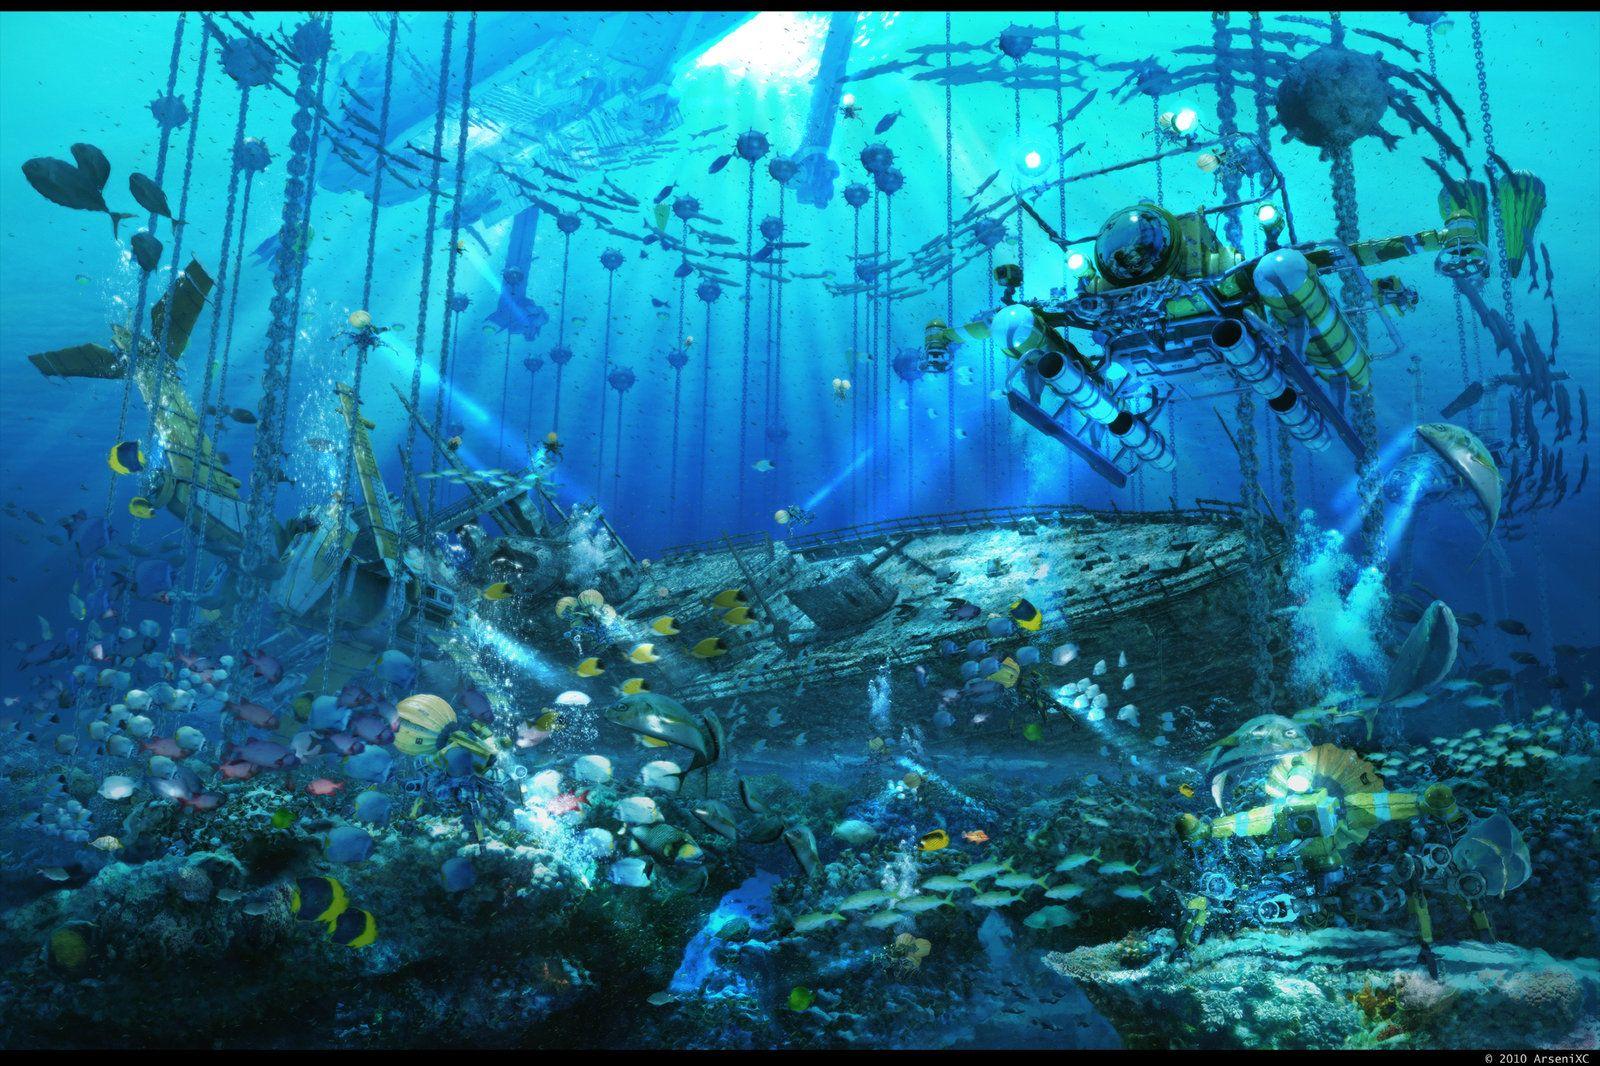 Mystery Of Underwater Treasure By Arsenixc Deviantart Com On